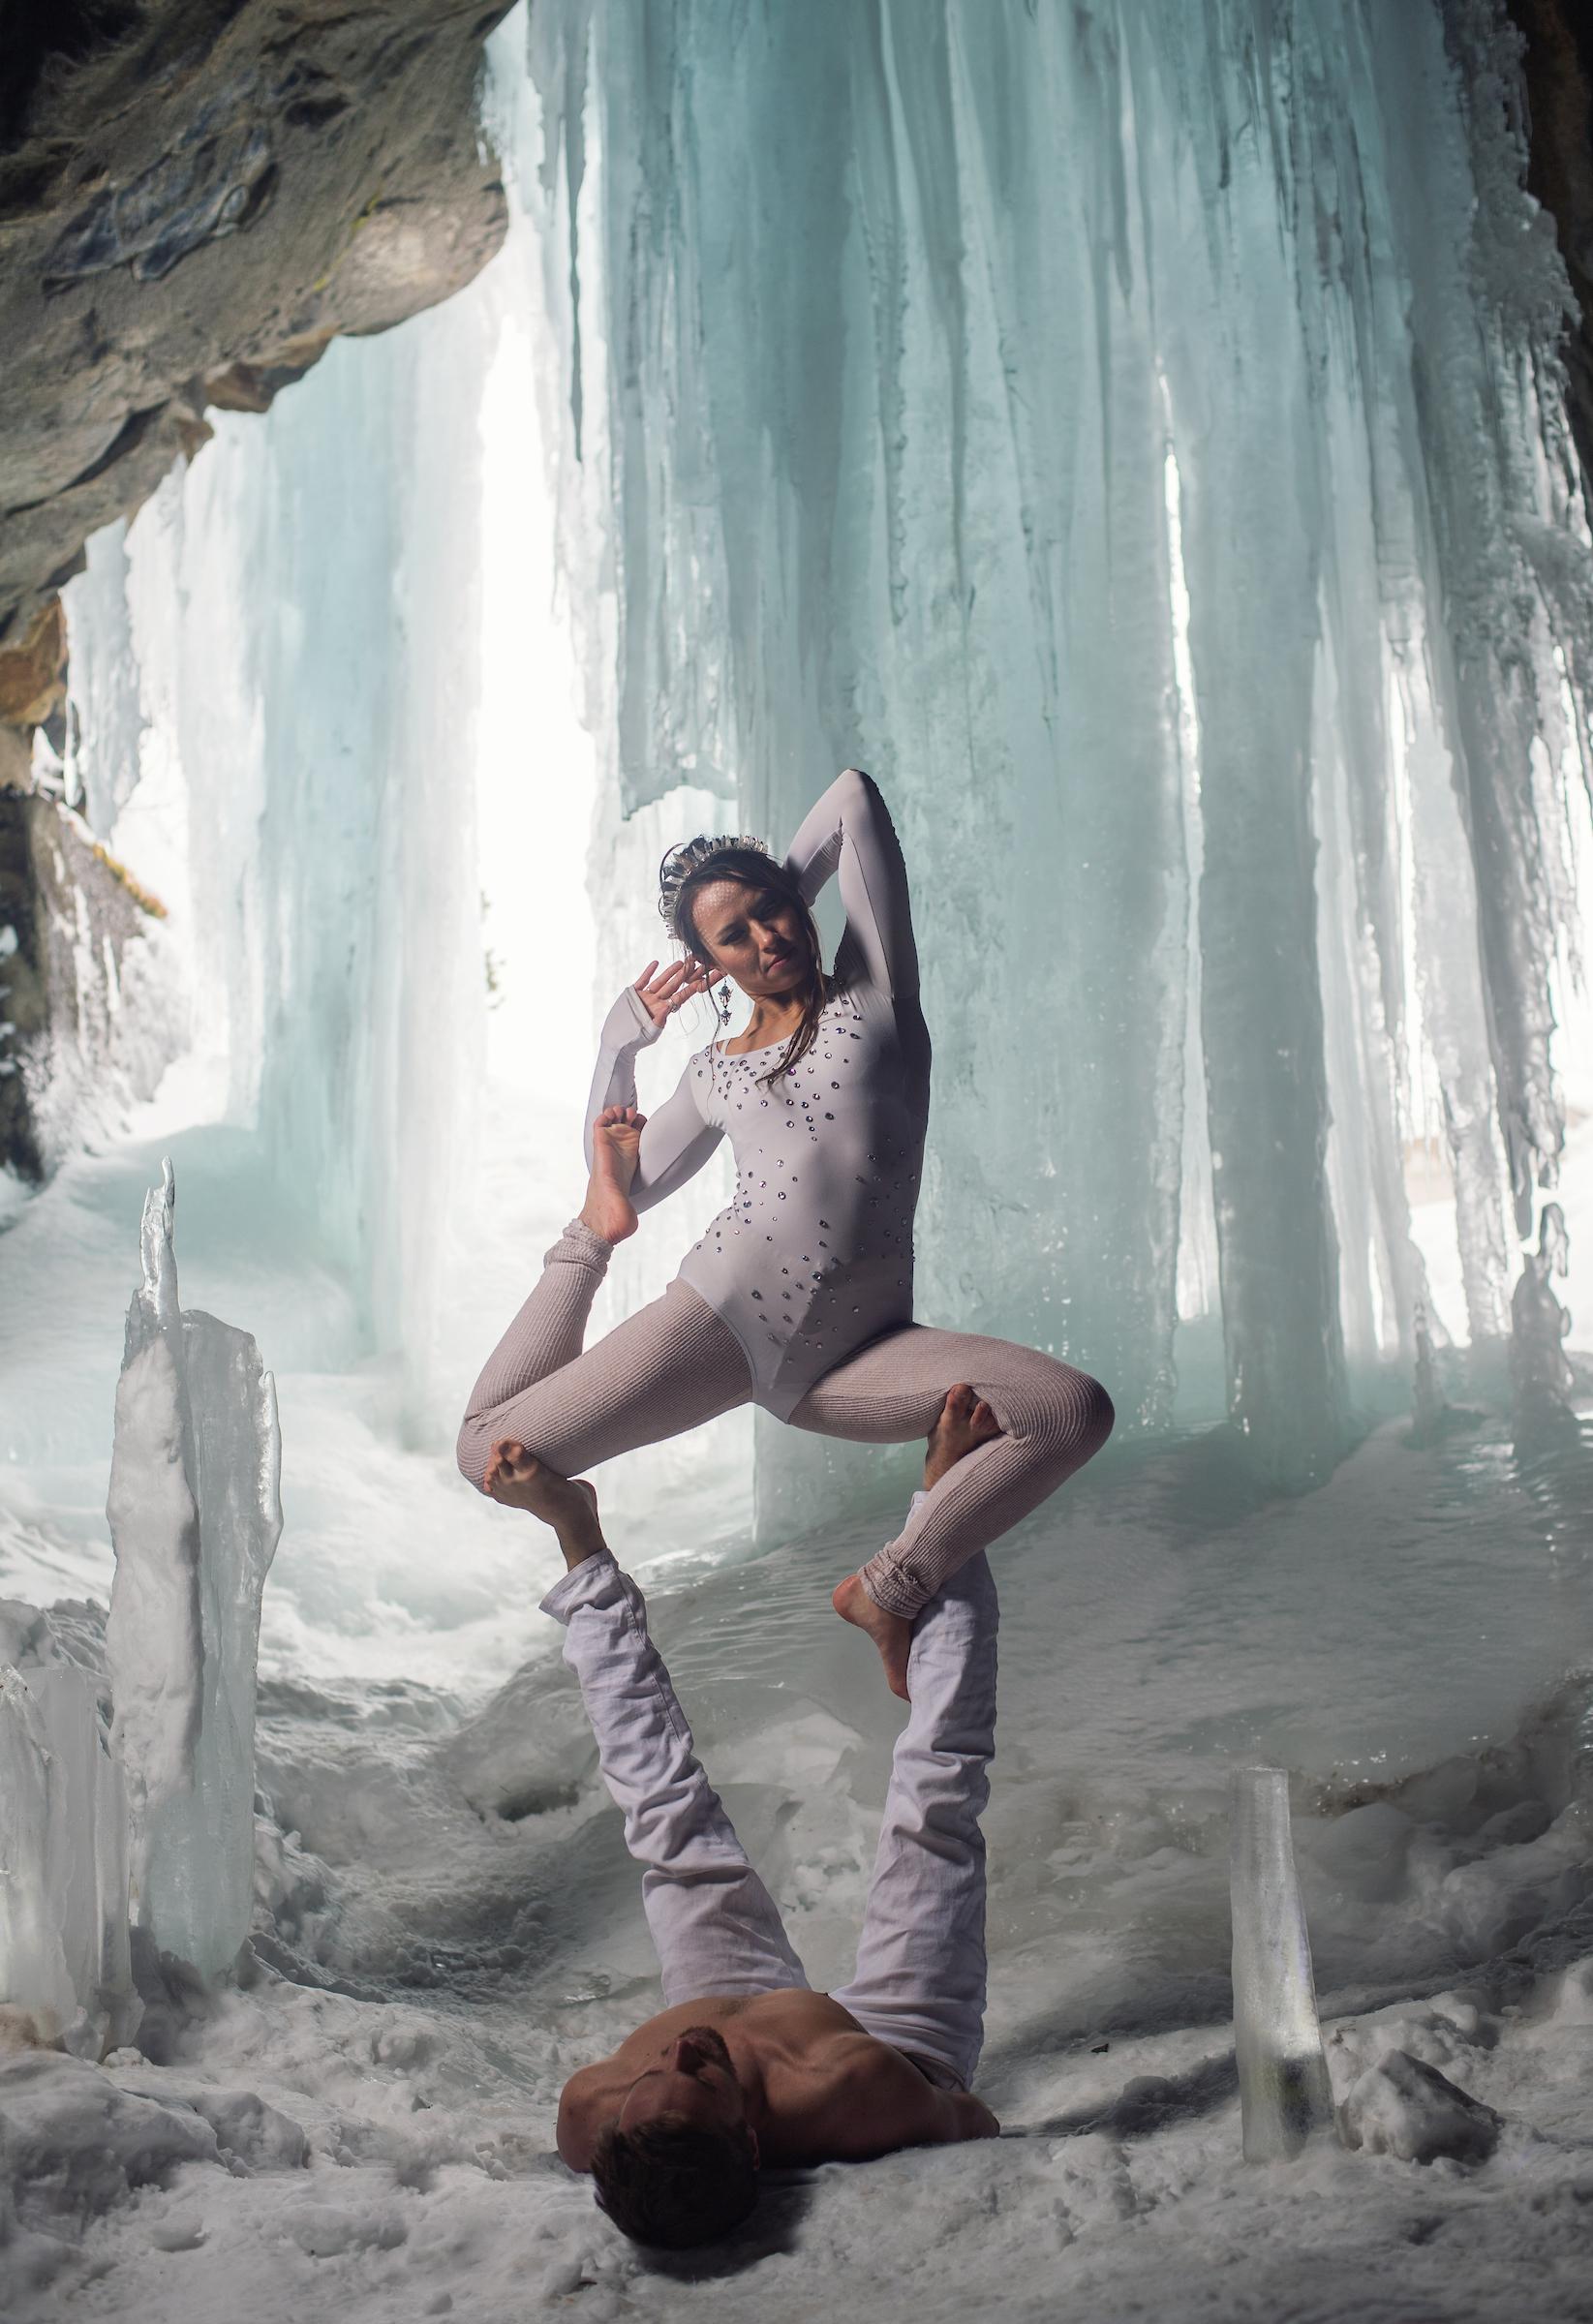 ice  30754 .jpg